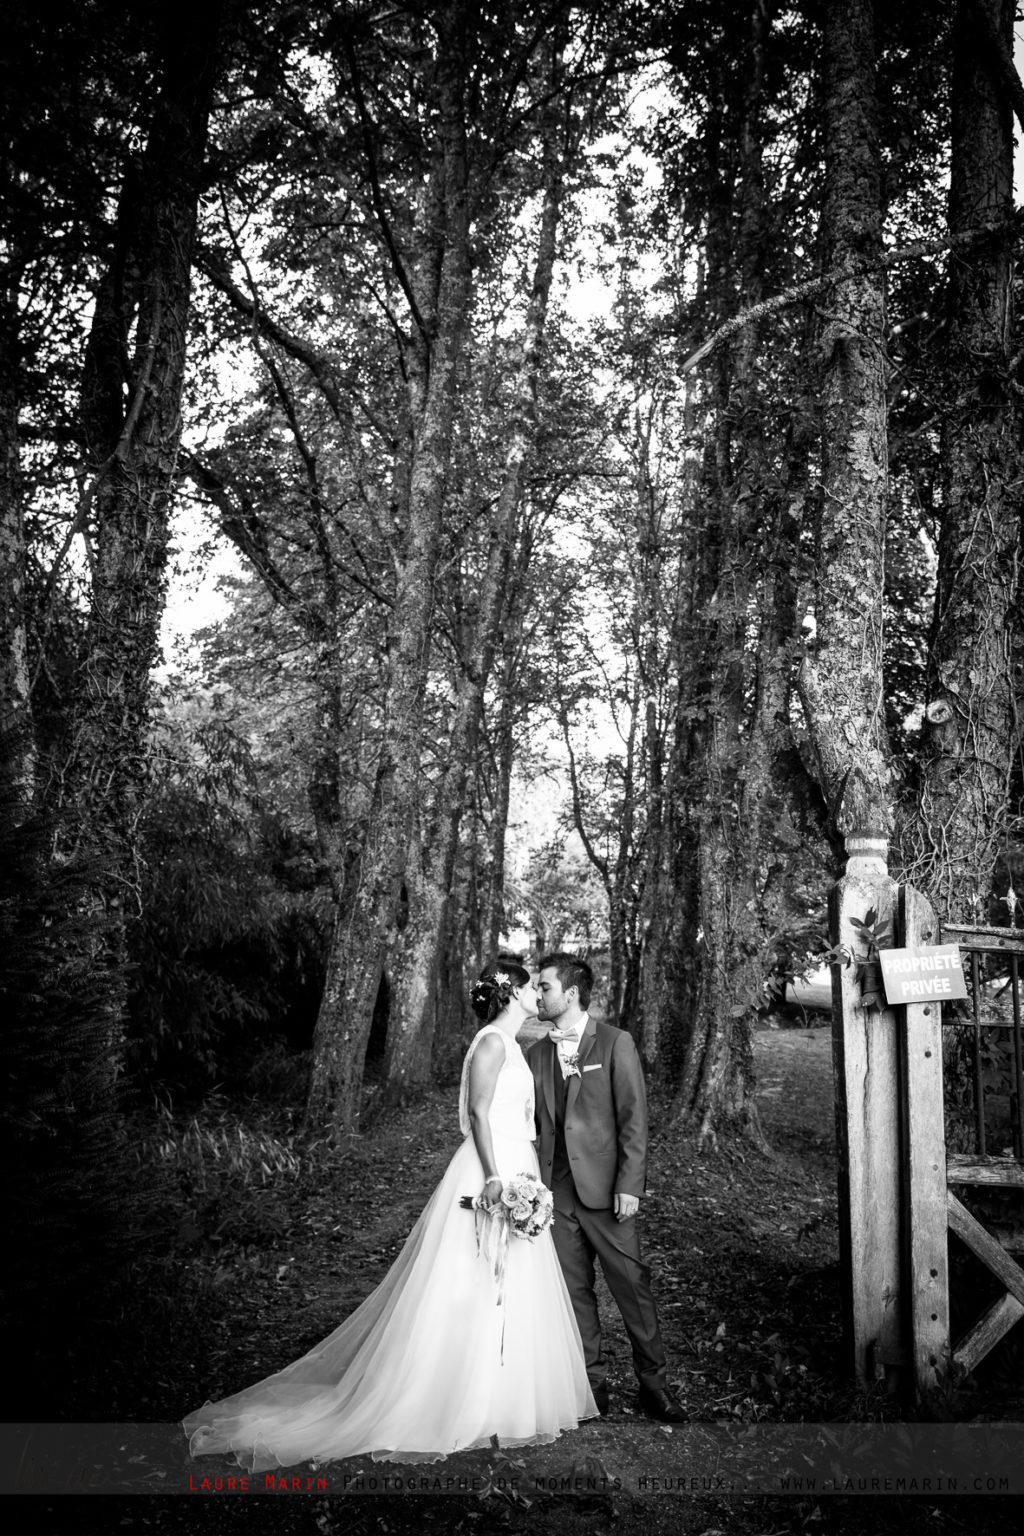 © Laure Marin Photographe Mariage Couple_71105